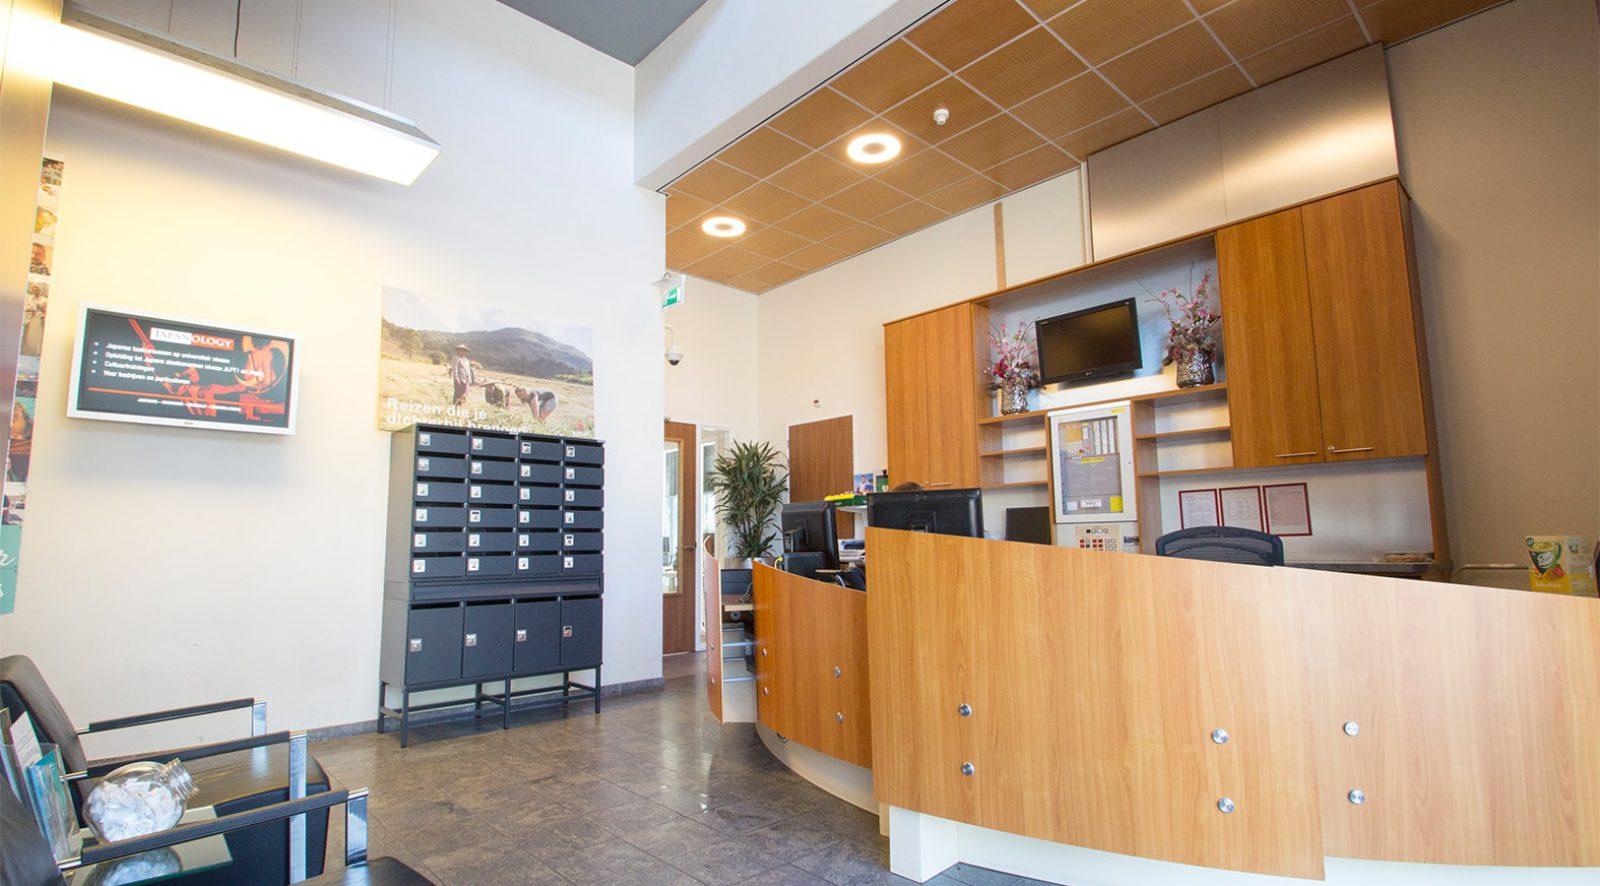 Kantoor huren in Leiden | Crown Business Center Lammenschans